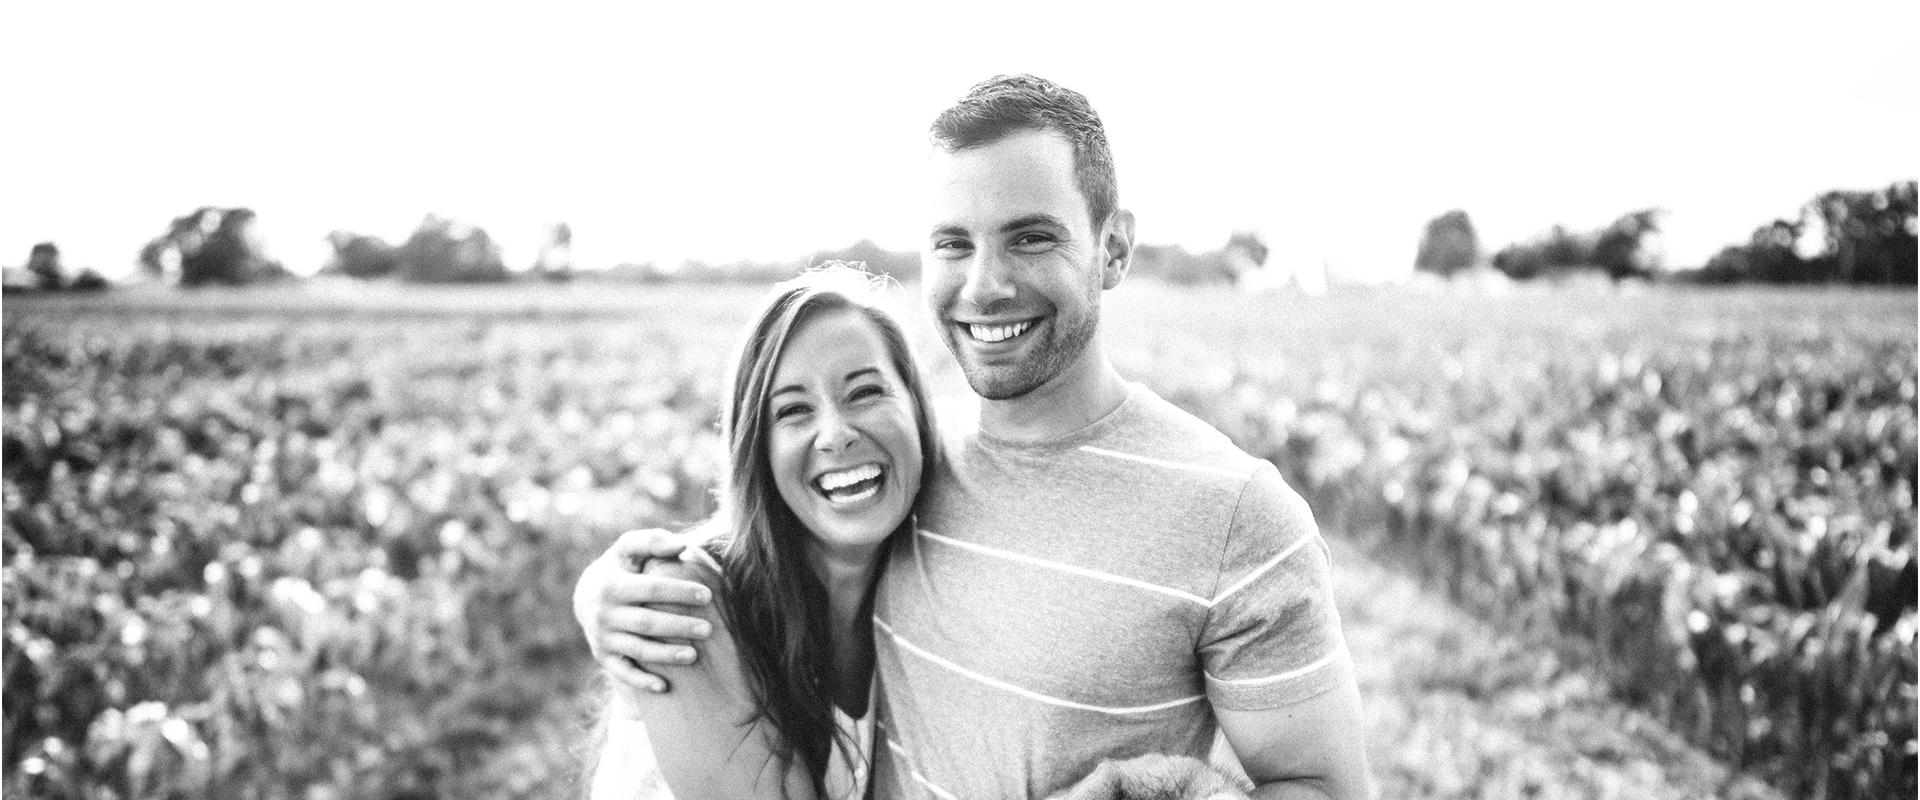 Draper Utah Couples Therapy couple 2